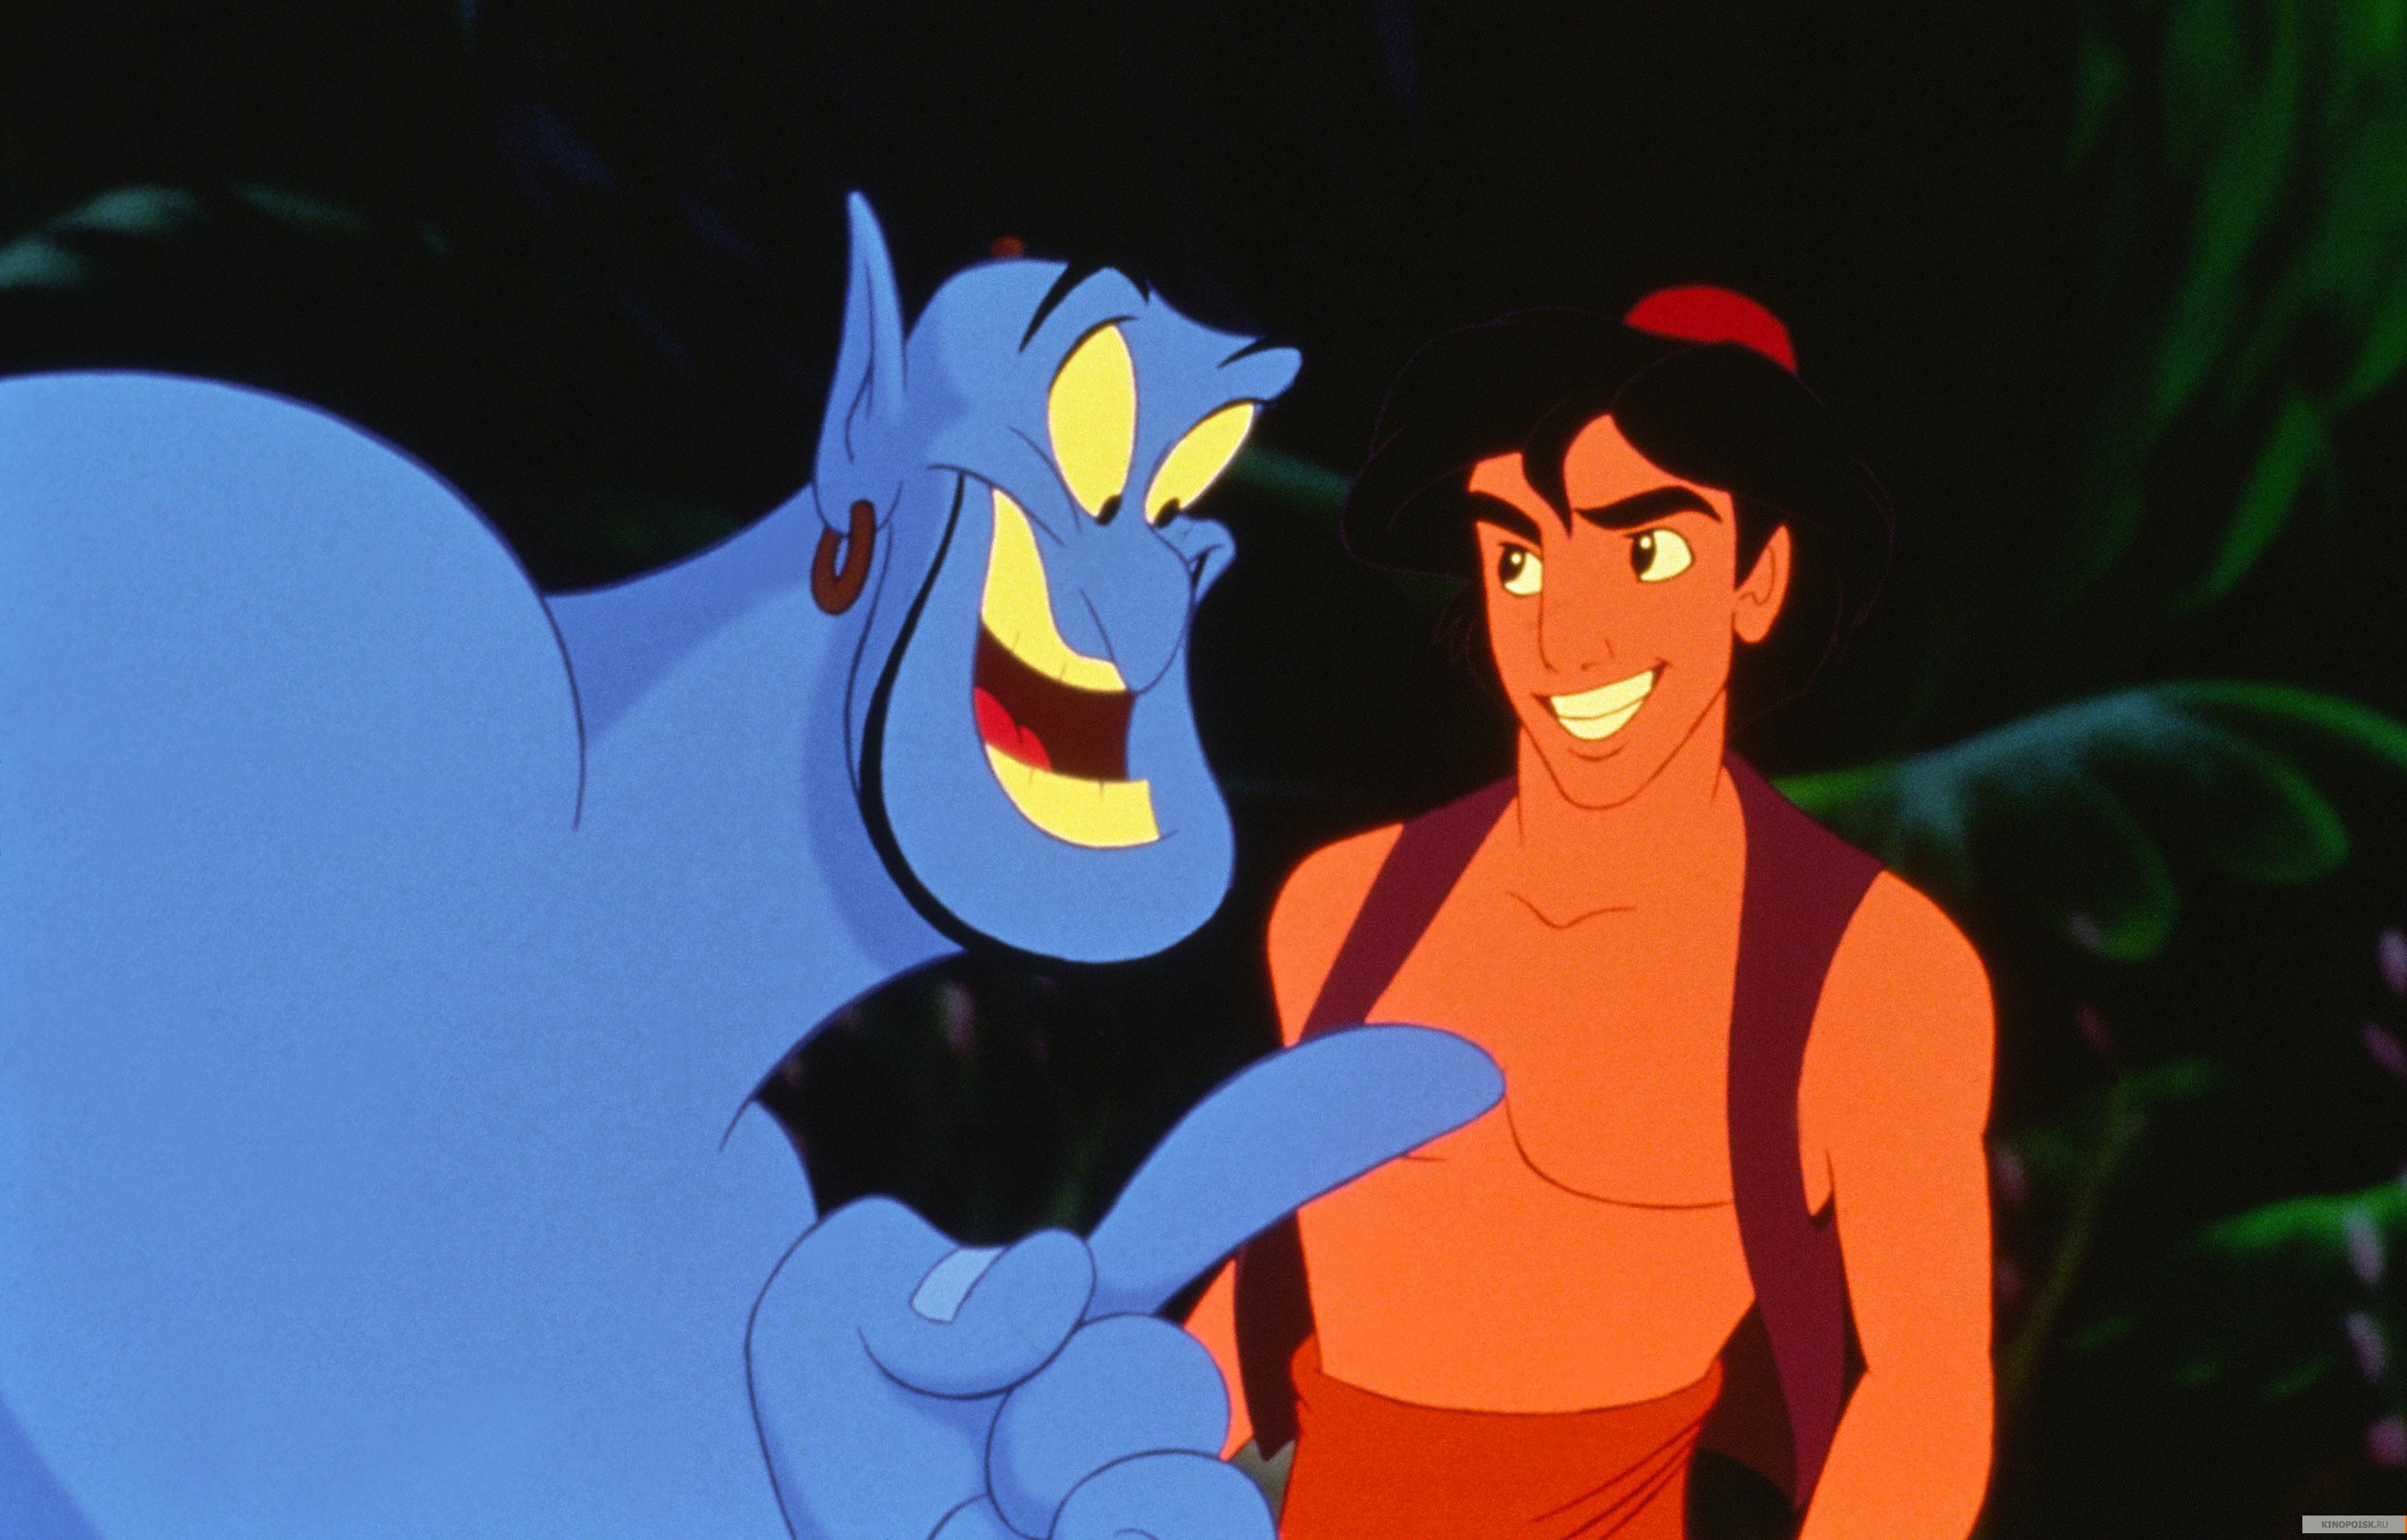 http://st-im.kinopoisk.ru/im/kadr/9/3/2/kinopoisk.ru-Aladdin-932358.jpg